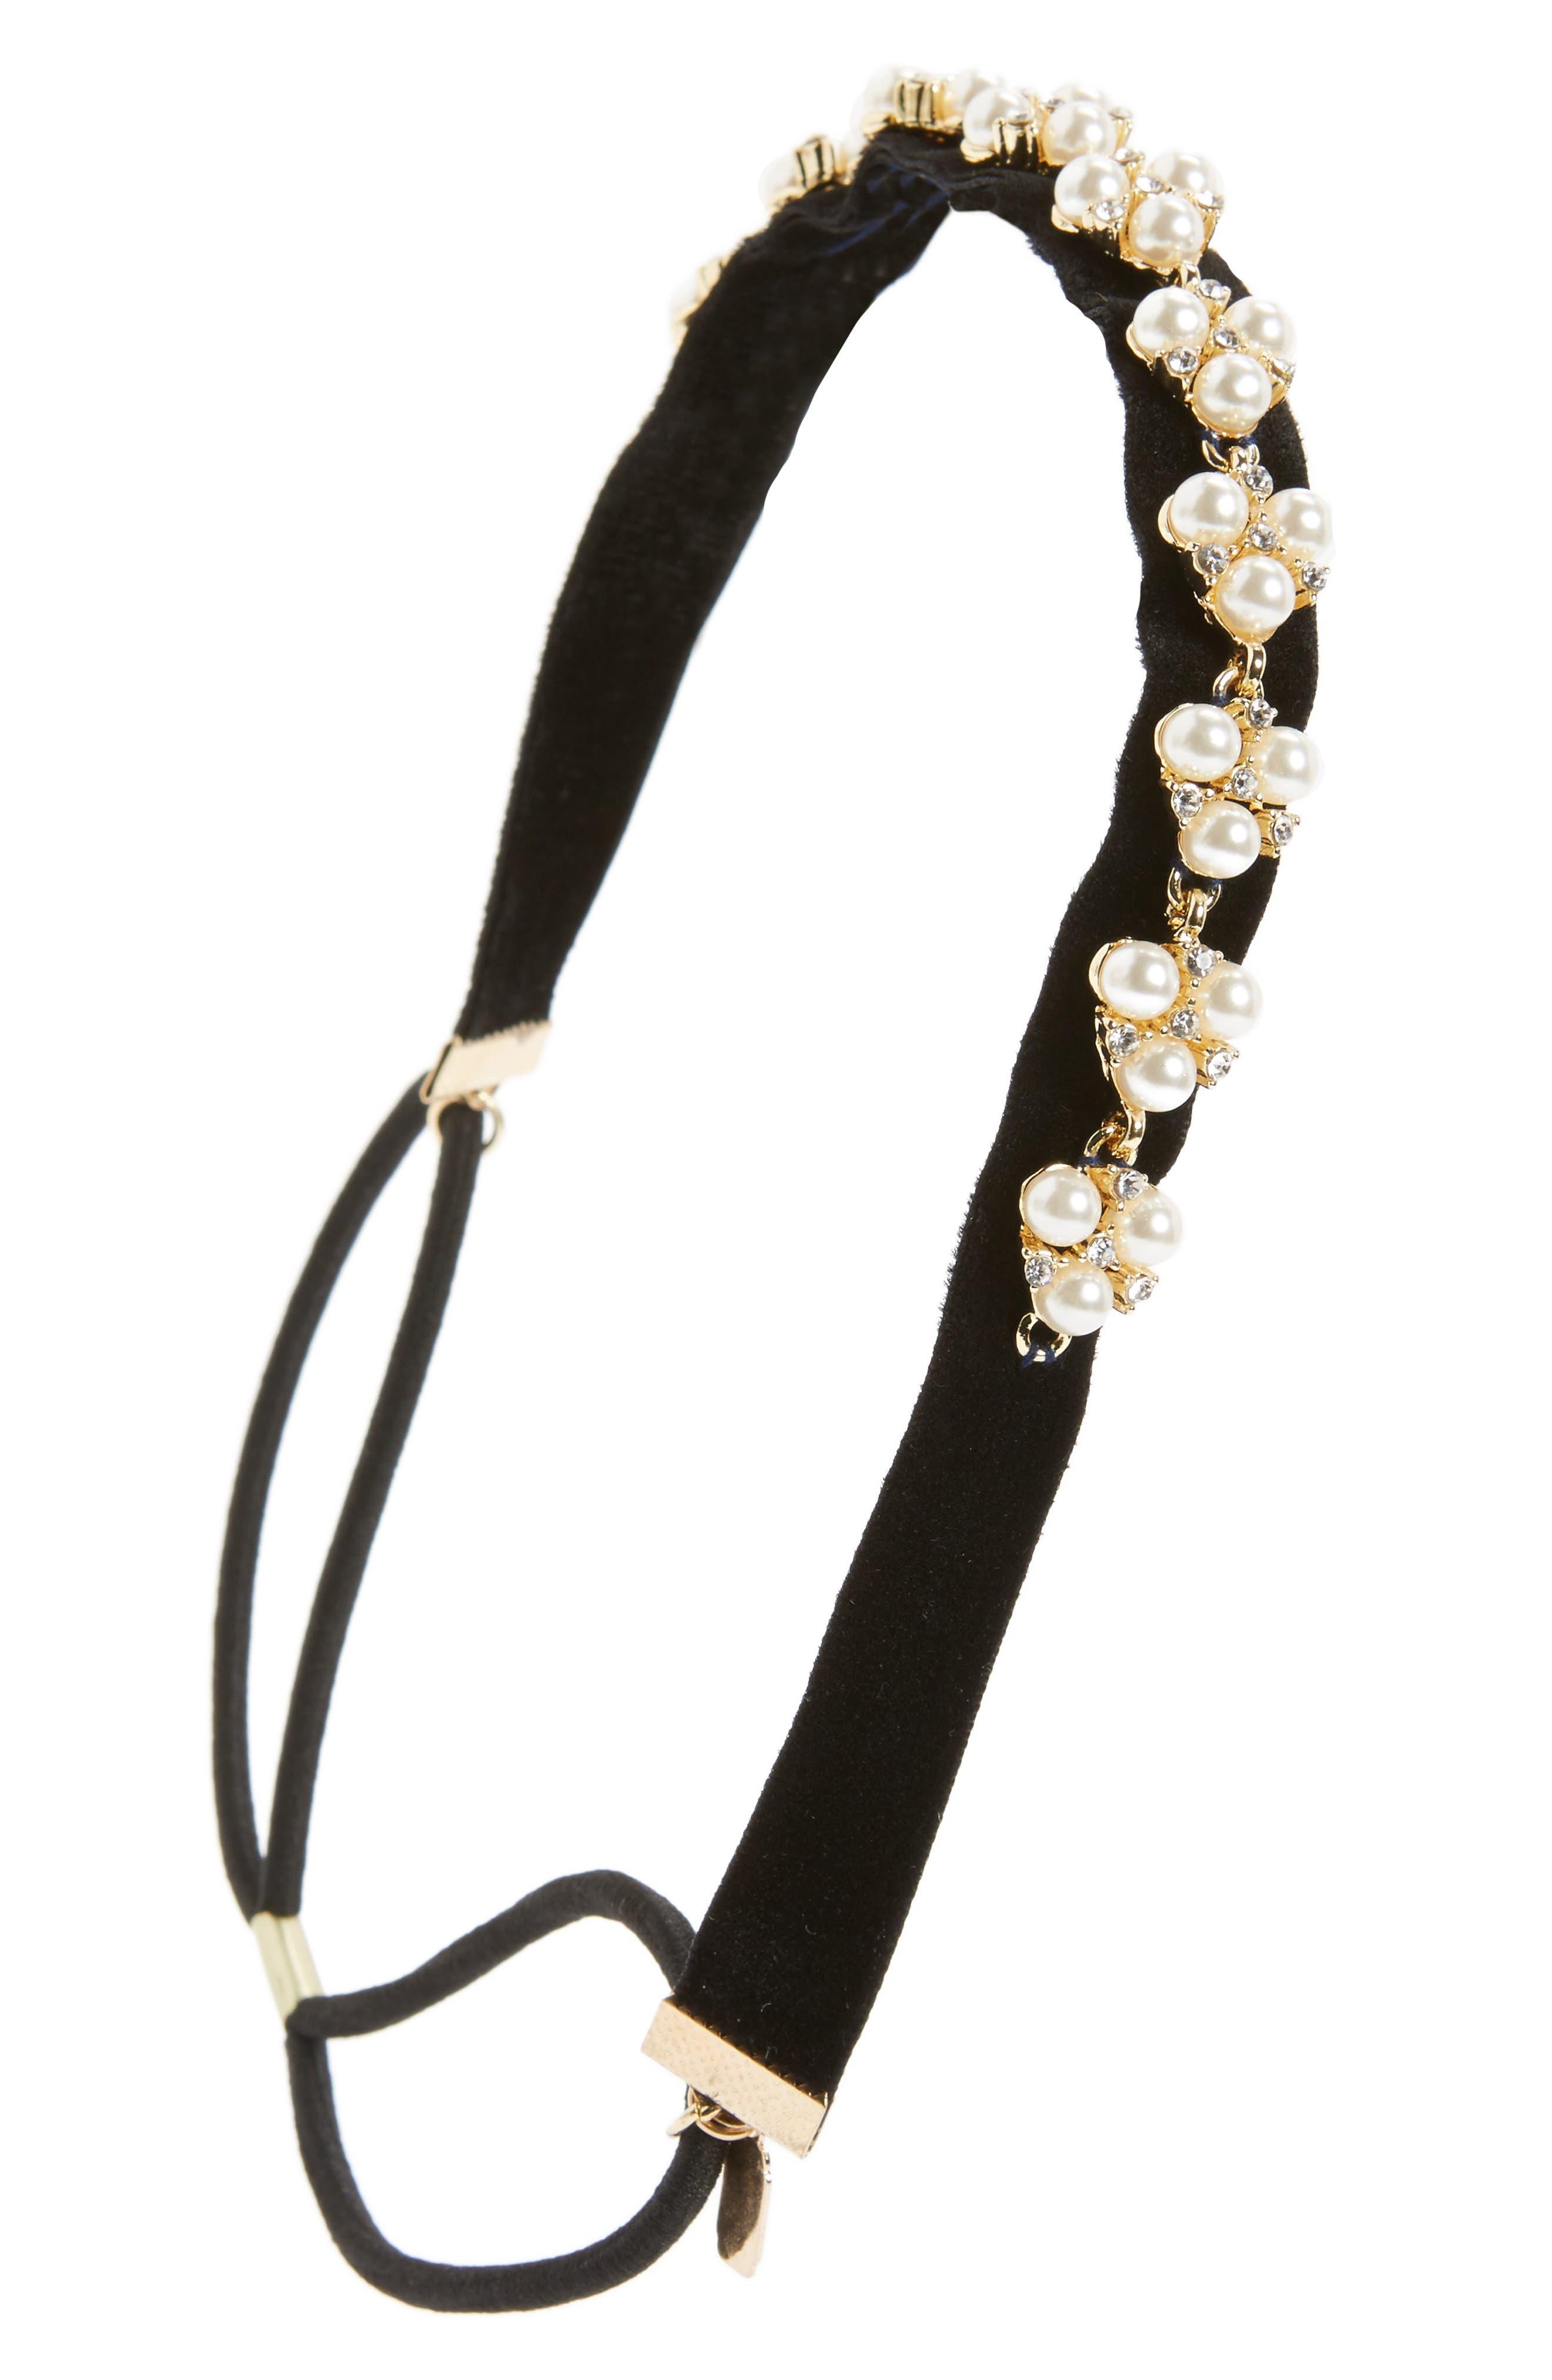 Crystal & Imitation Pearl Embellished Headwrap,                             Main thumbnail 1, color,                             Black